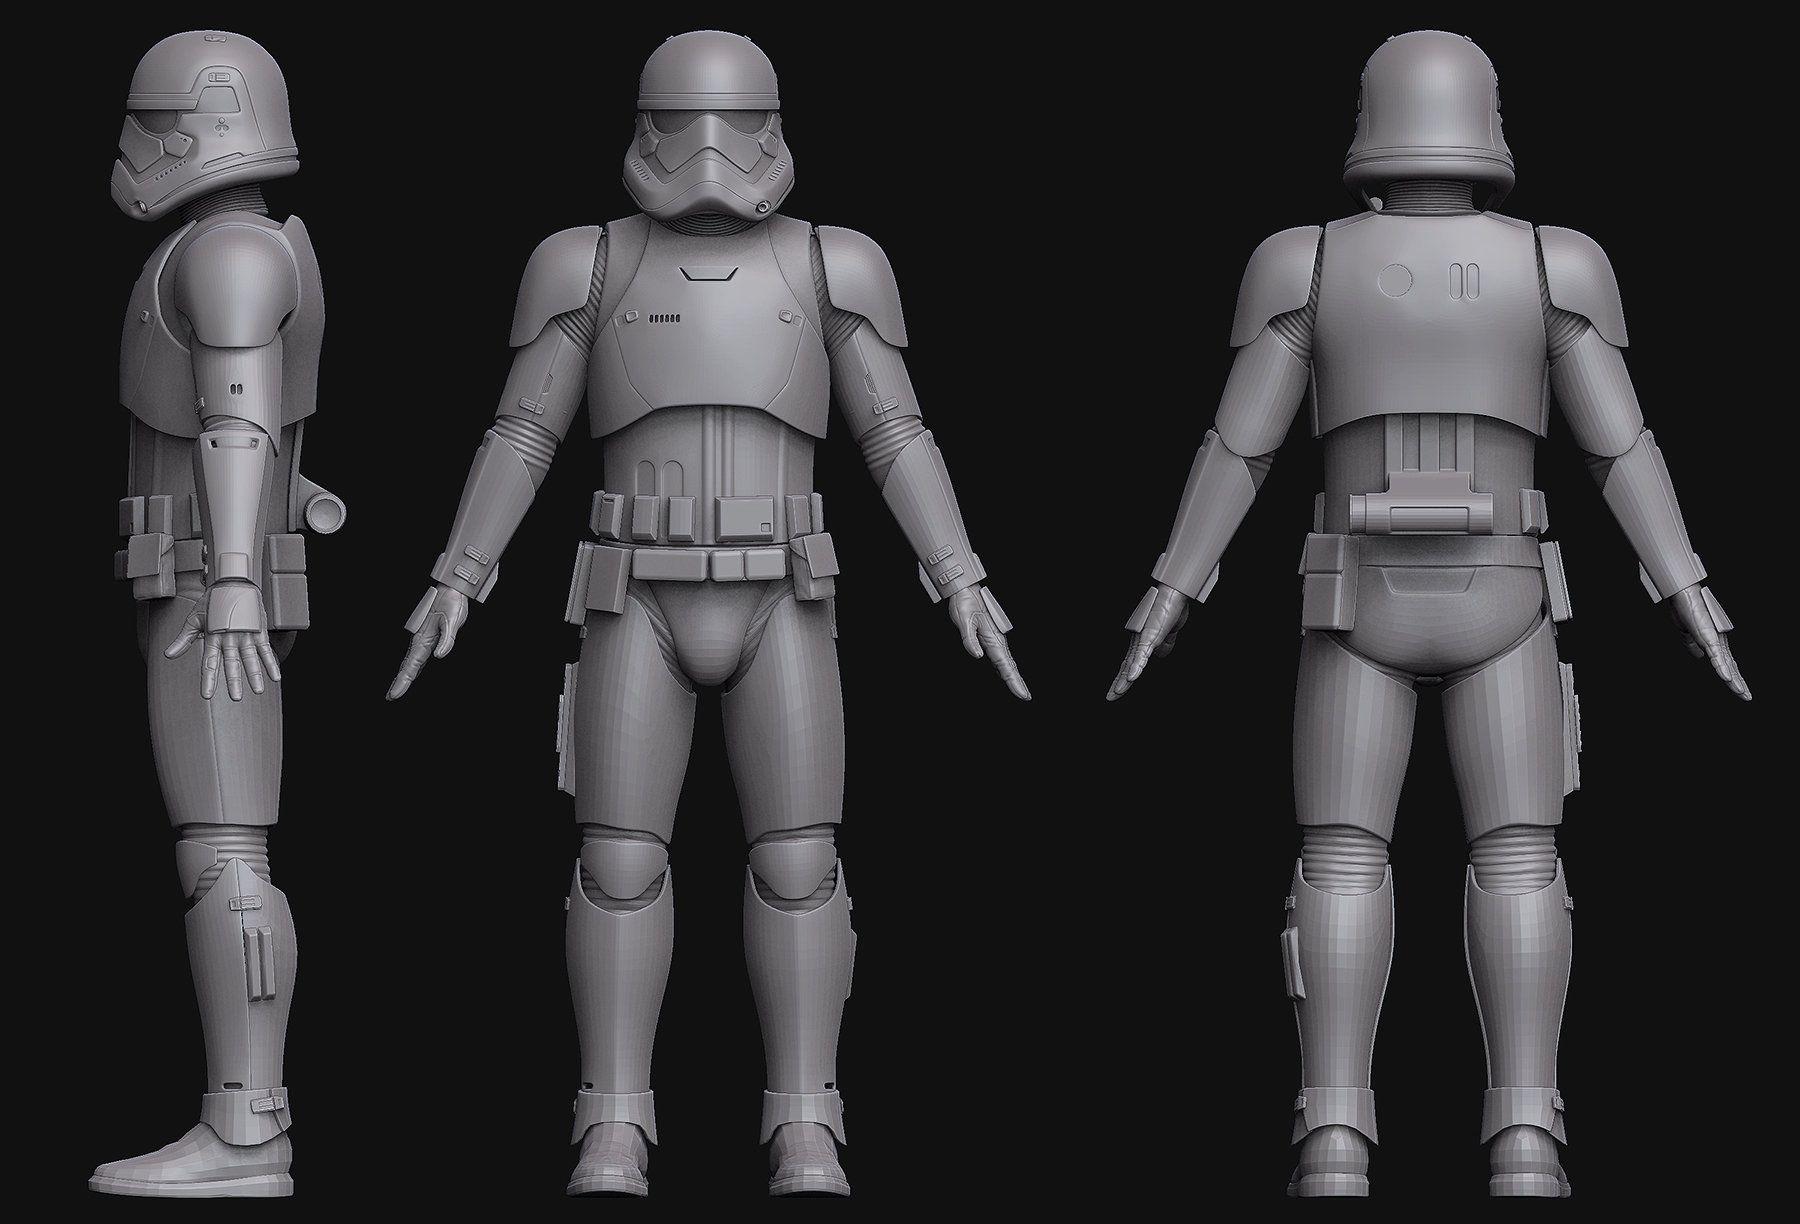 ArtStation - First Order Stormtrooper WIP, Darren Pattenden